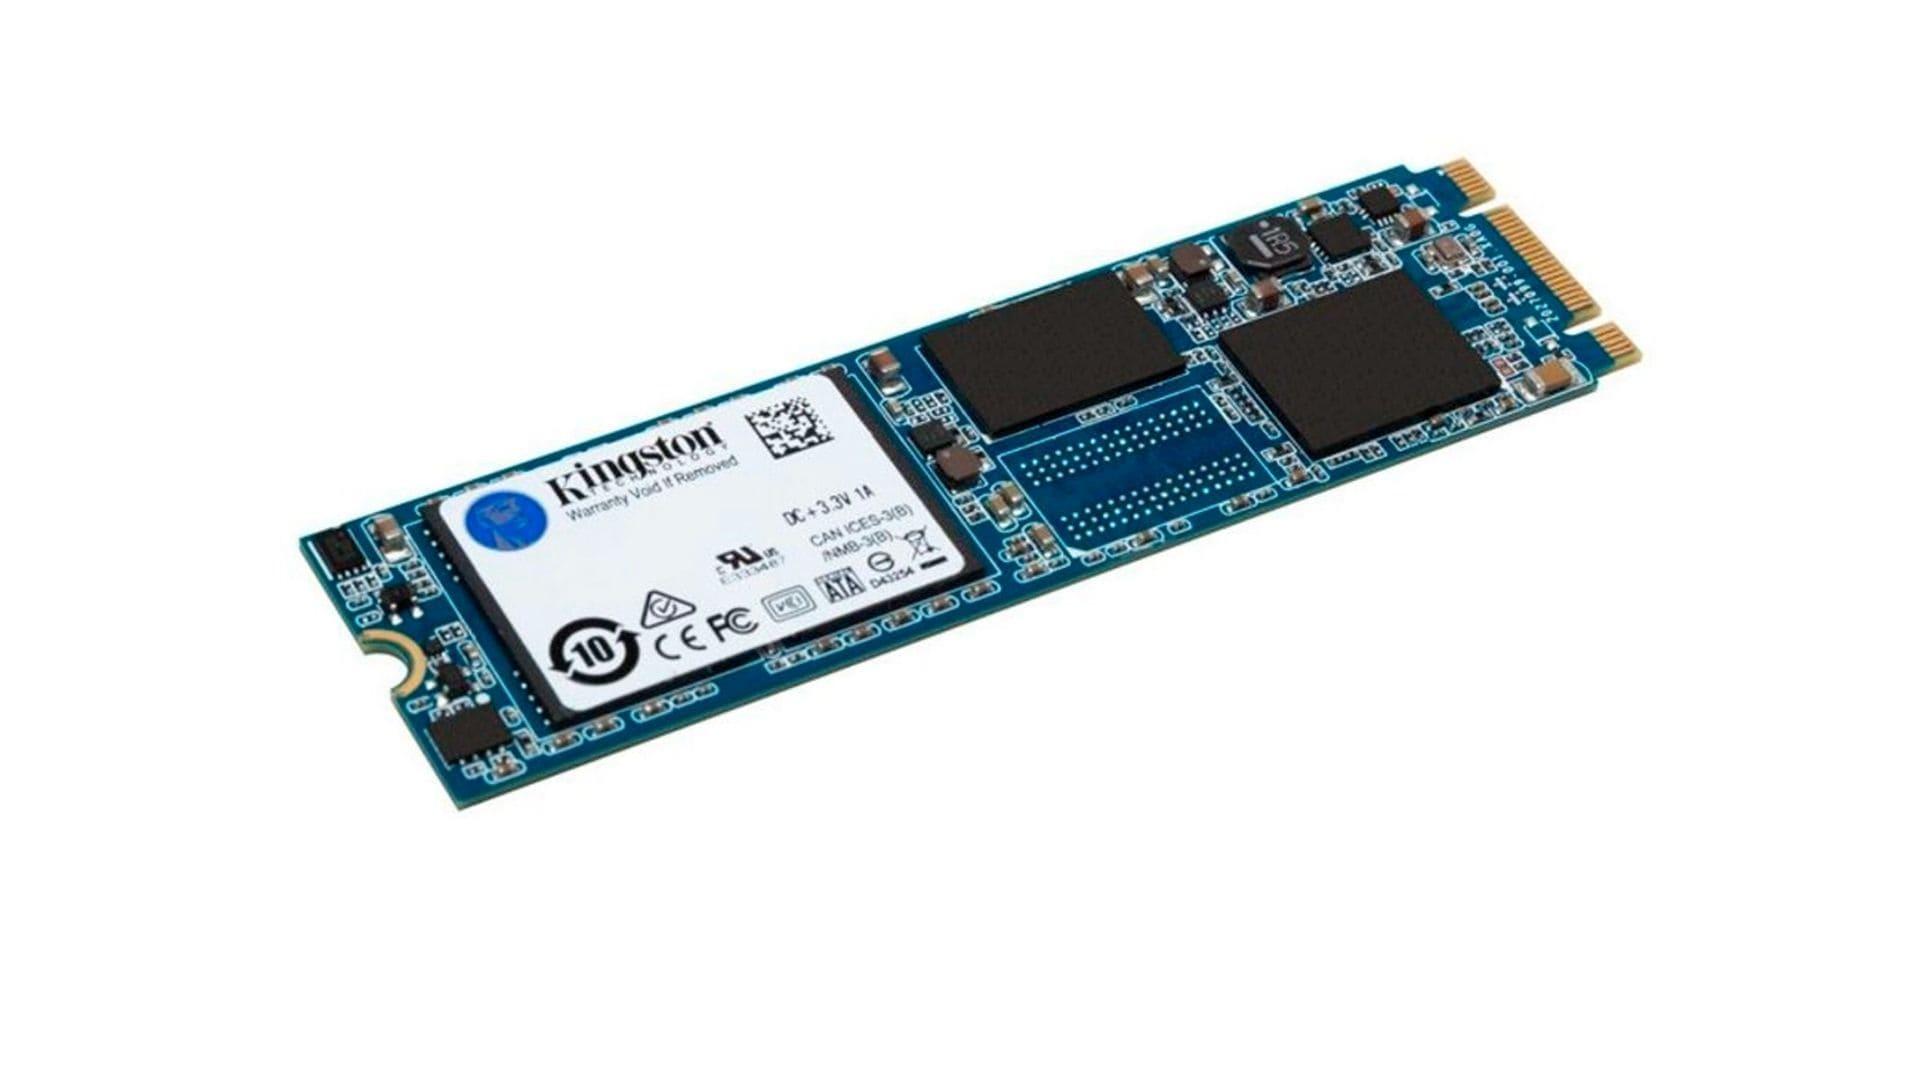 SSD 480GB M2 Kingston Suv500Ms preto e azul no fundo branco